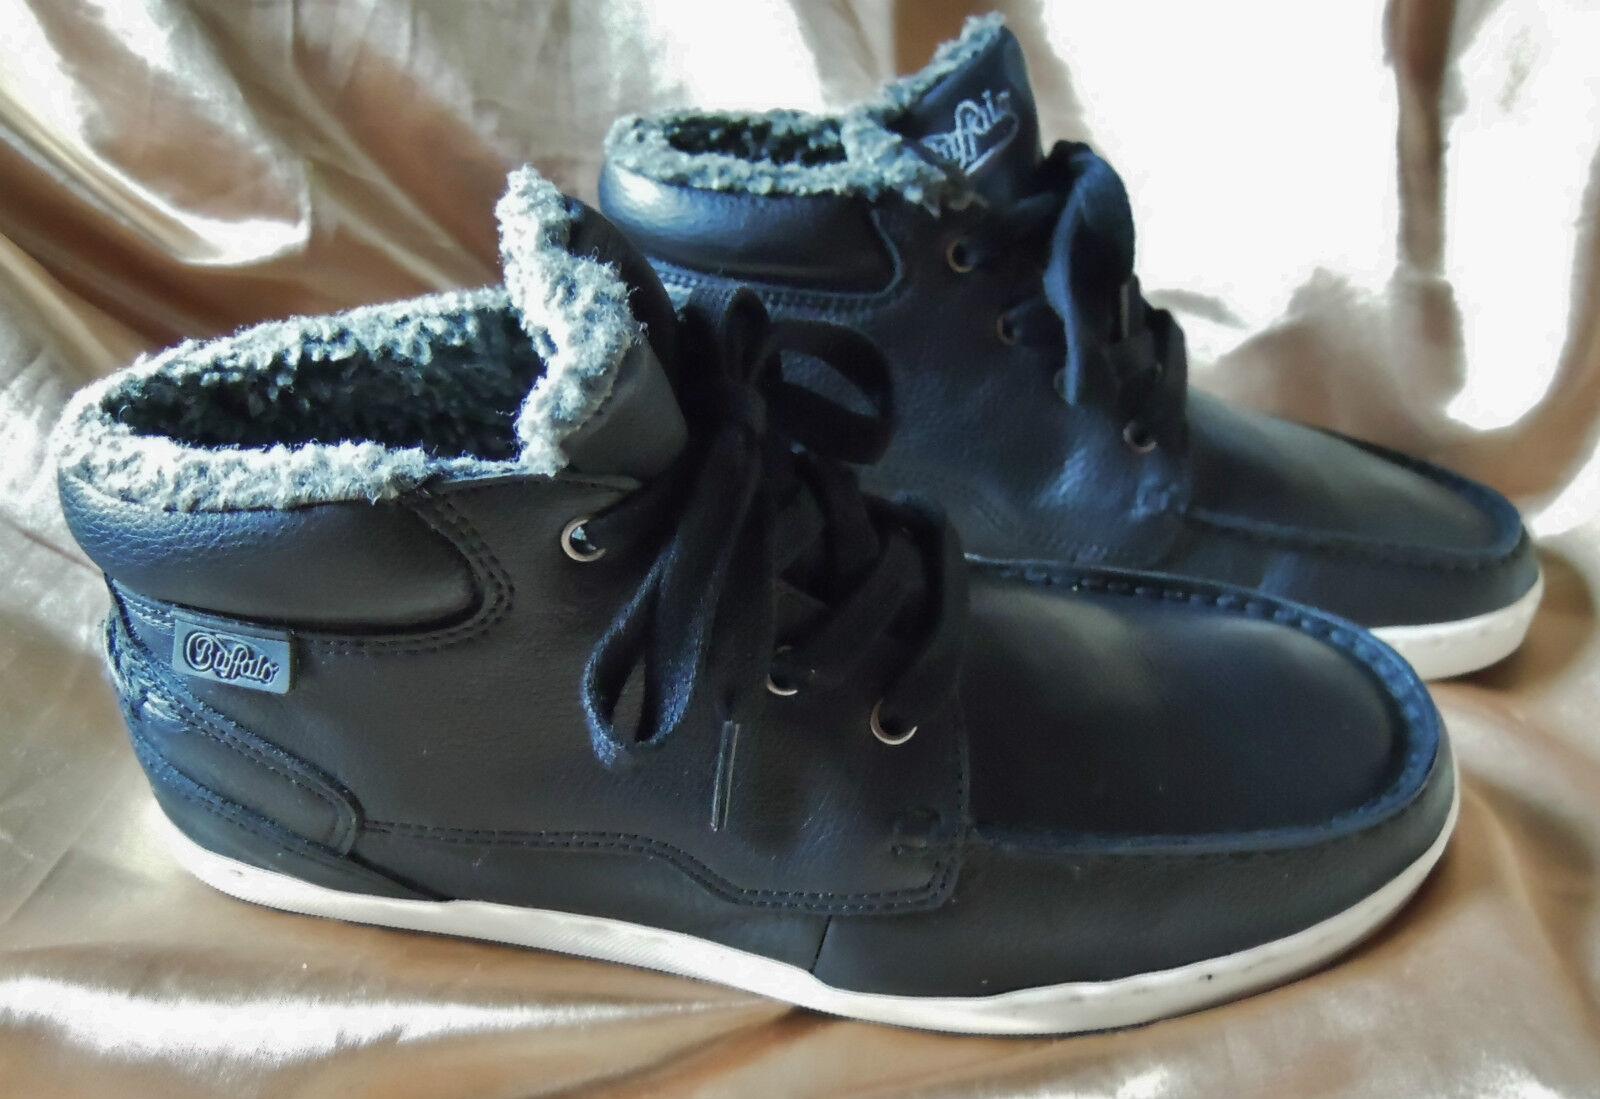 Buffalo botín cortos talla 40 negro negro negro acogedor fell comida cómomujerte intemporal  tiendas minoristas